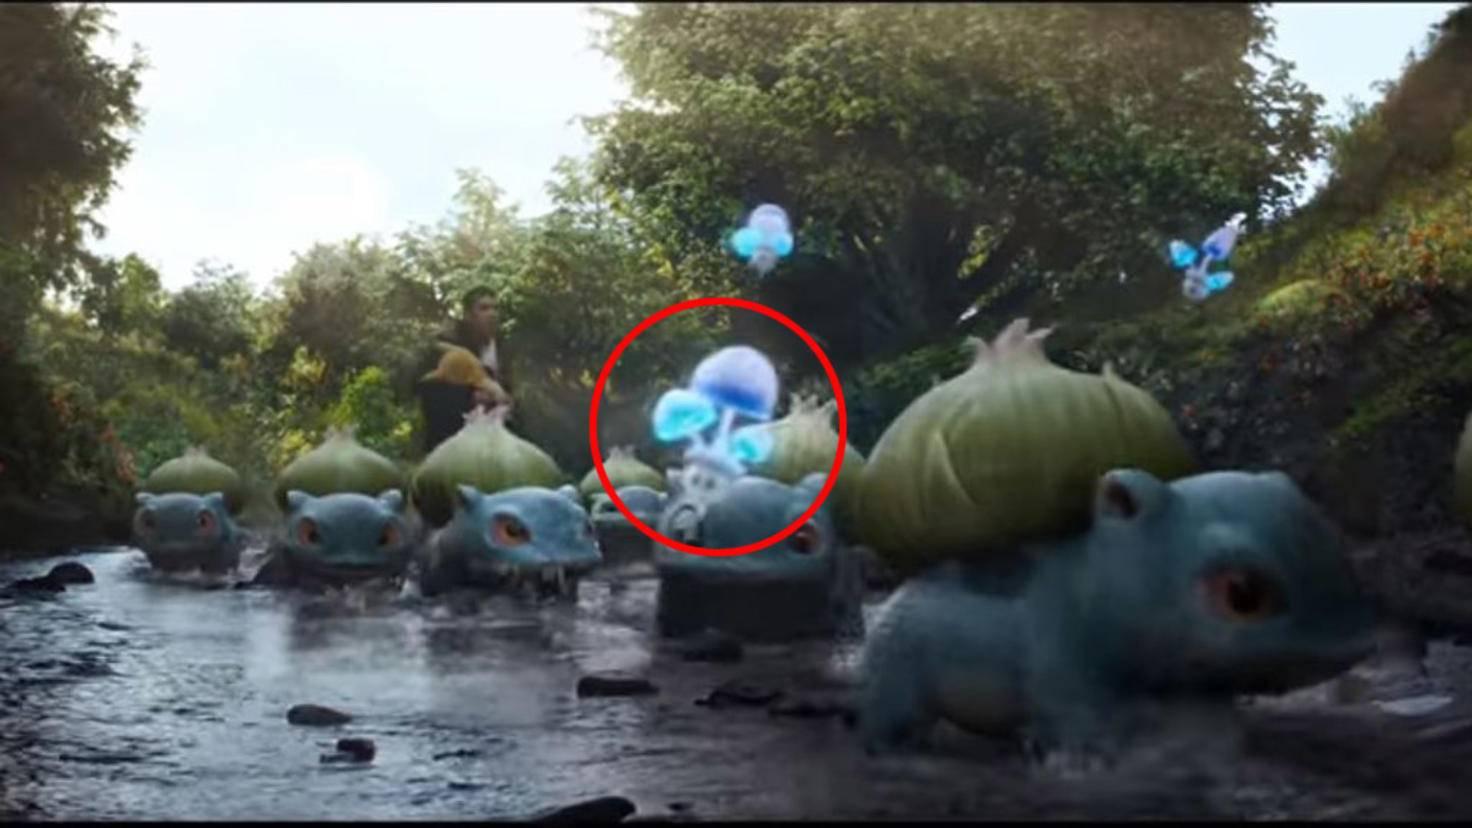 Bubungus in Pokémon Detective Pikachu